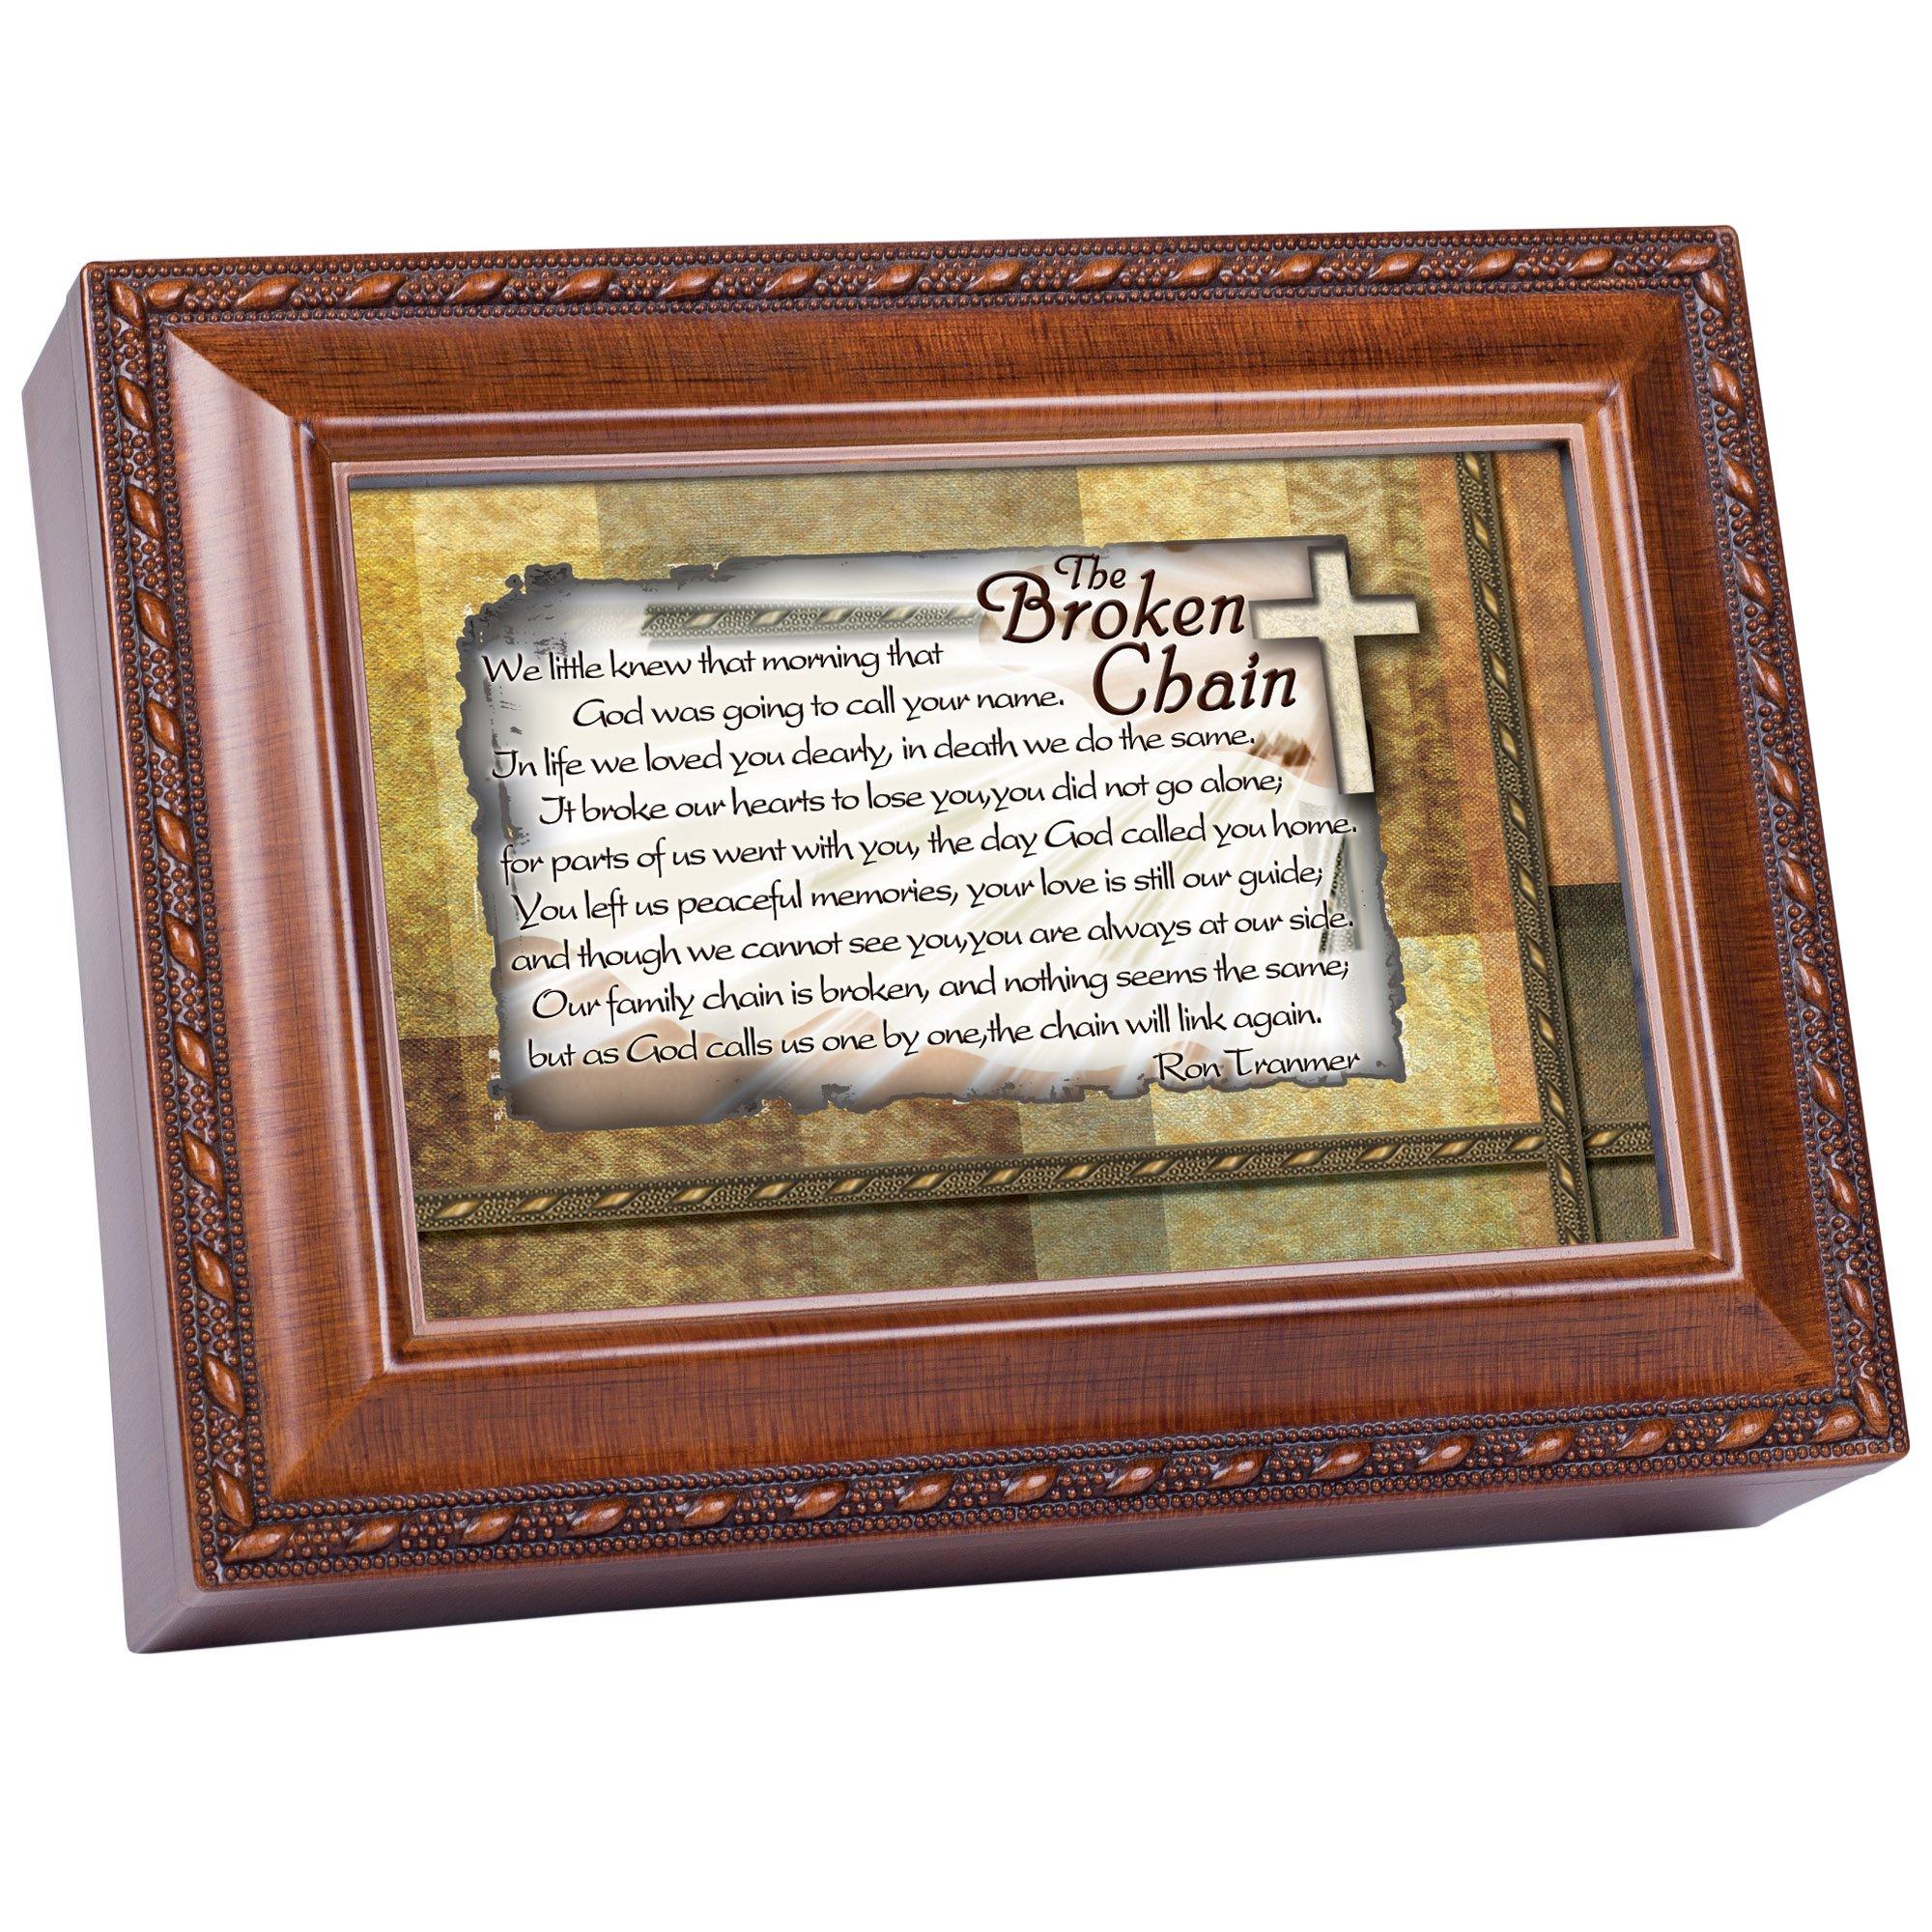 Cottage Garden The Broken Chain Inspirational Woodgrain Traditional Music Box Plays Amazing Grace